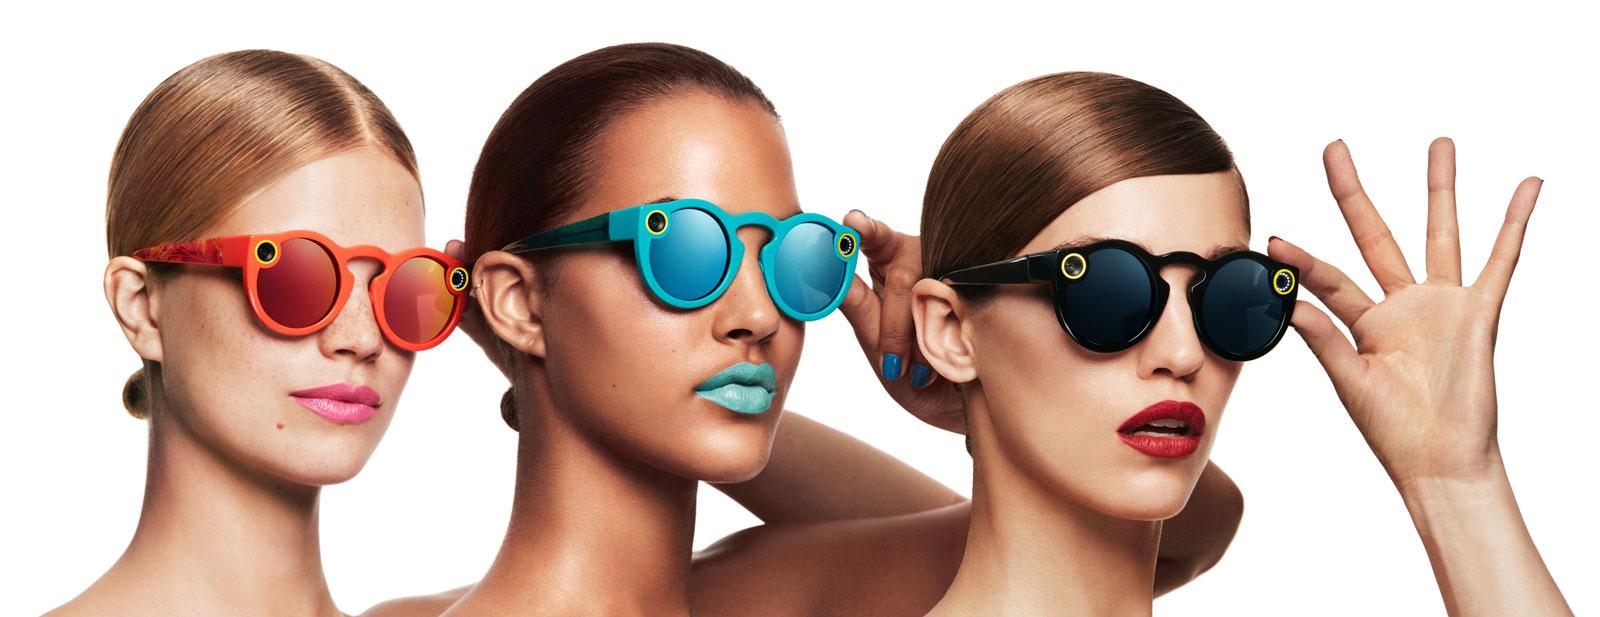 spectaclestroiscouleurs